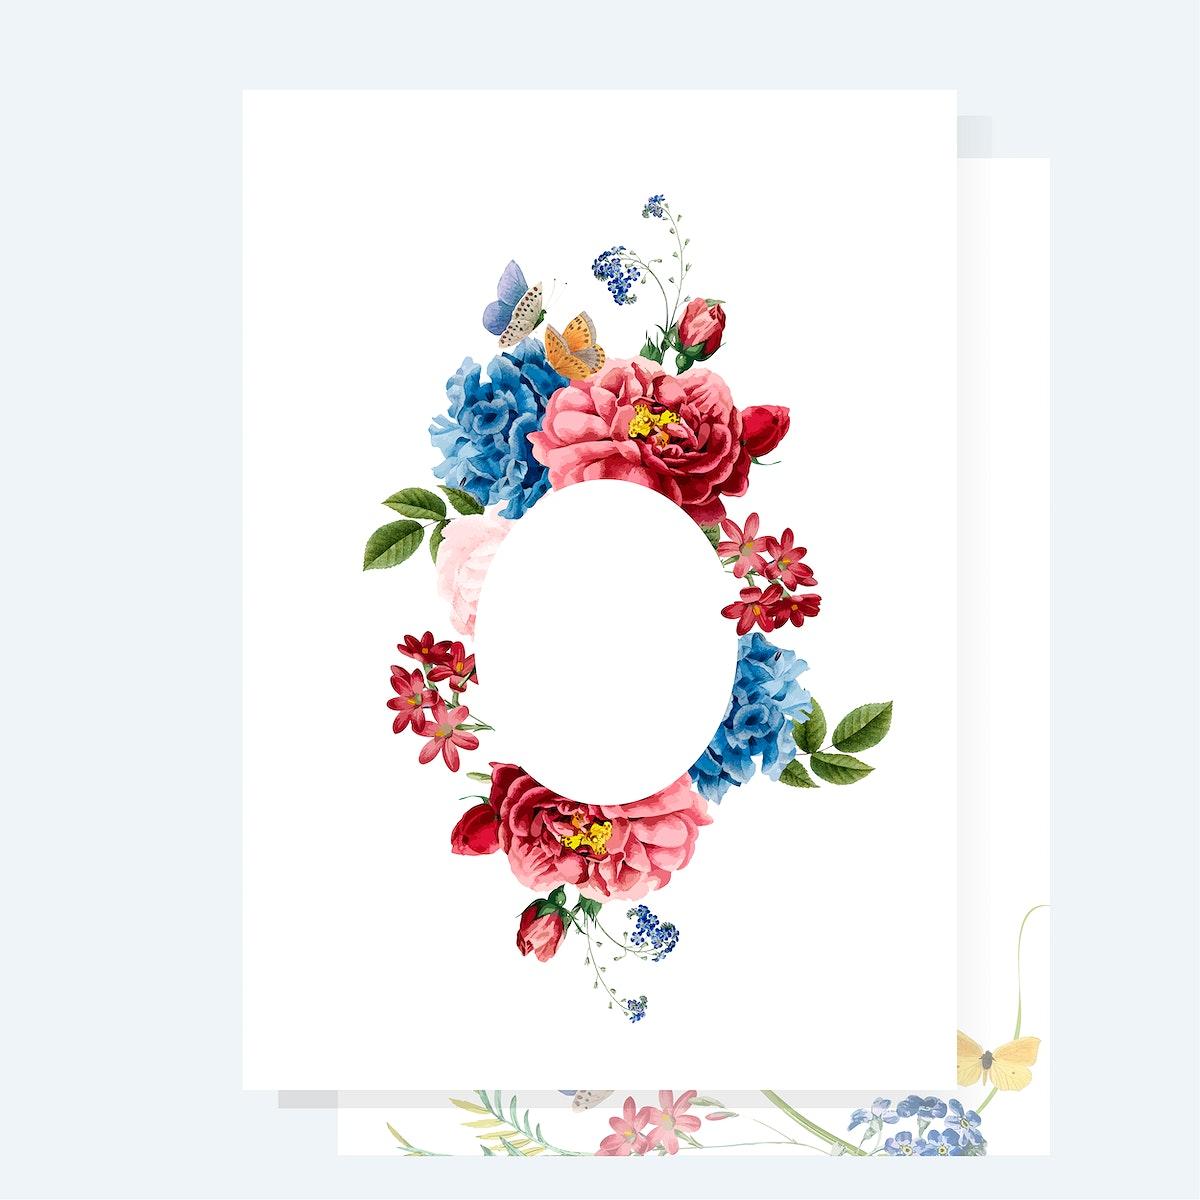 Floral invitation card mockup illustration